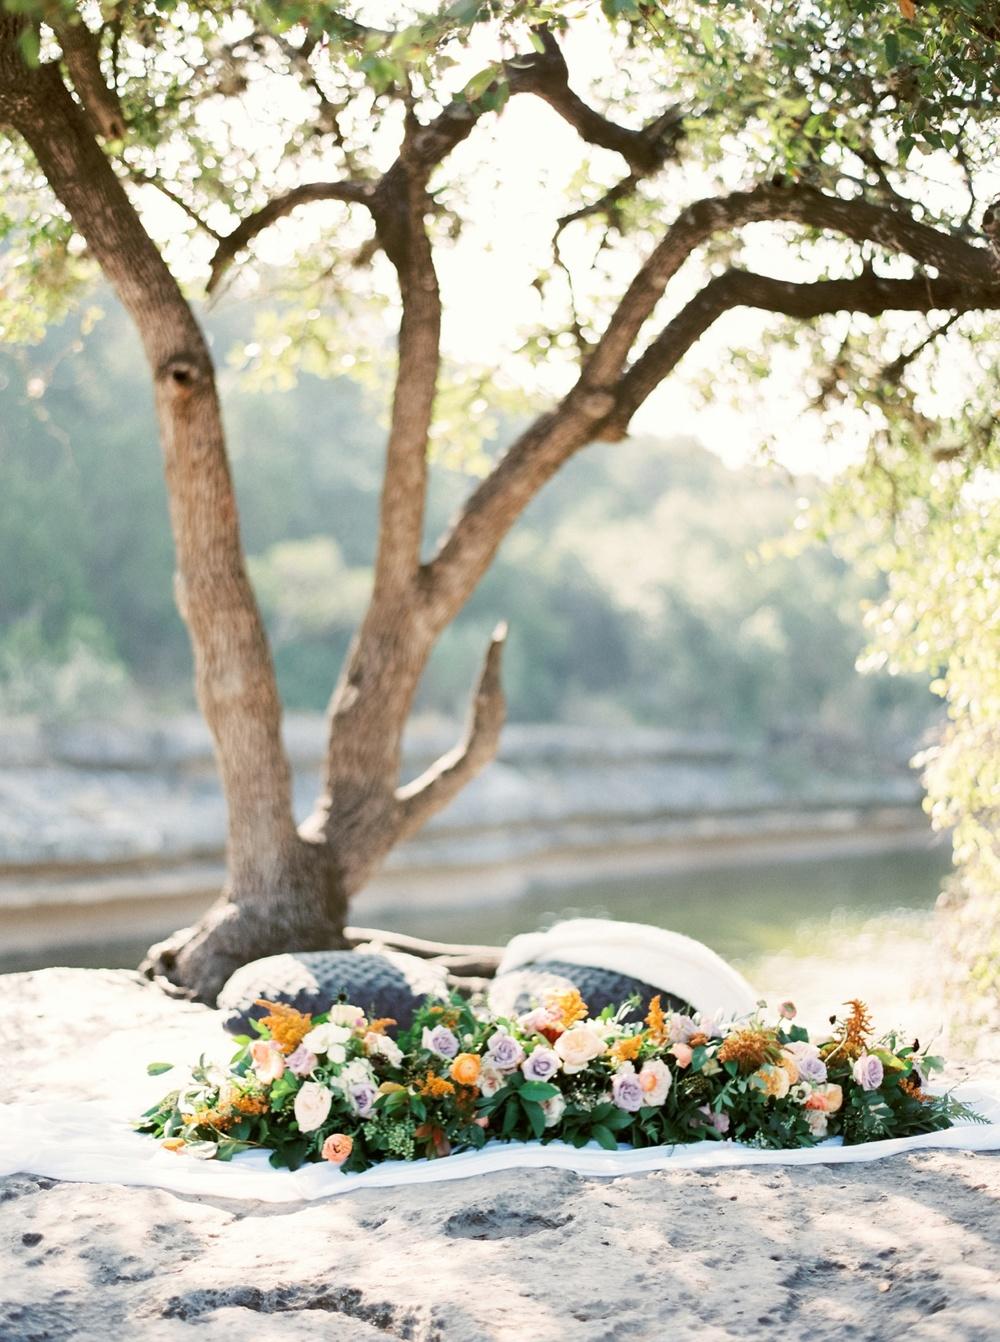 Candelaria Designs | Austin Floral Design